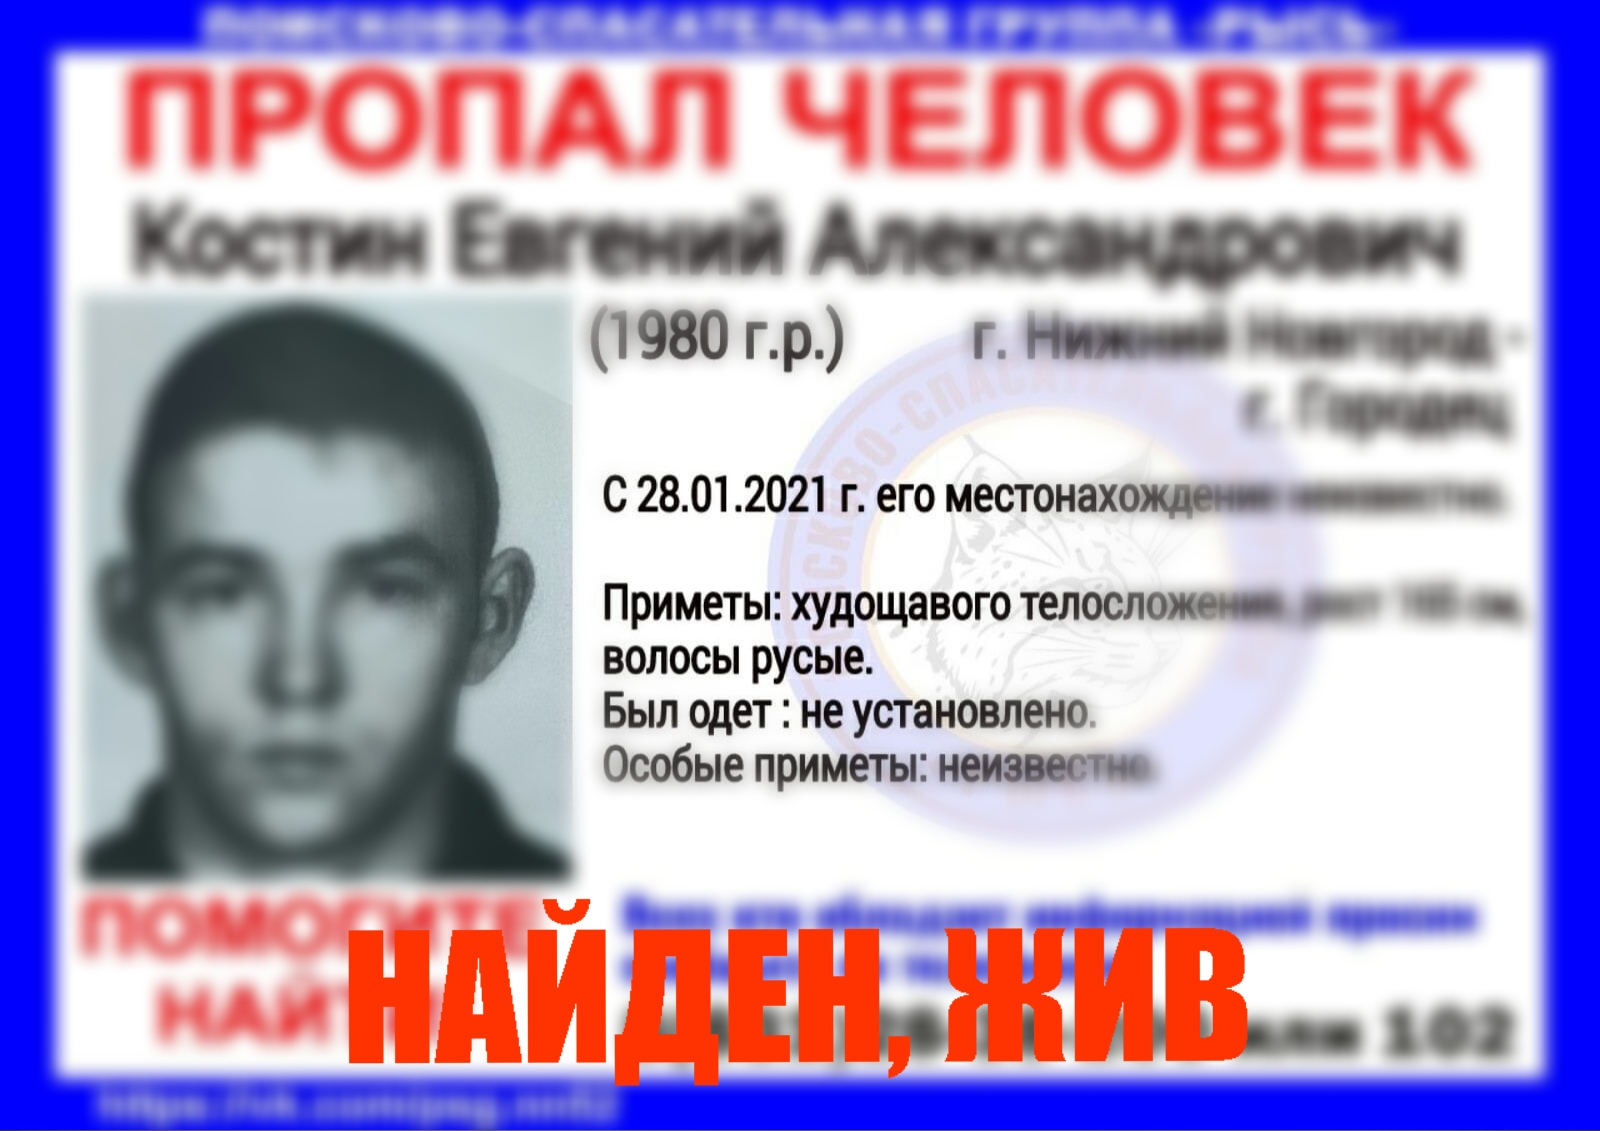 Костин Евгений Александрович, 1980 г.р., г. Городец